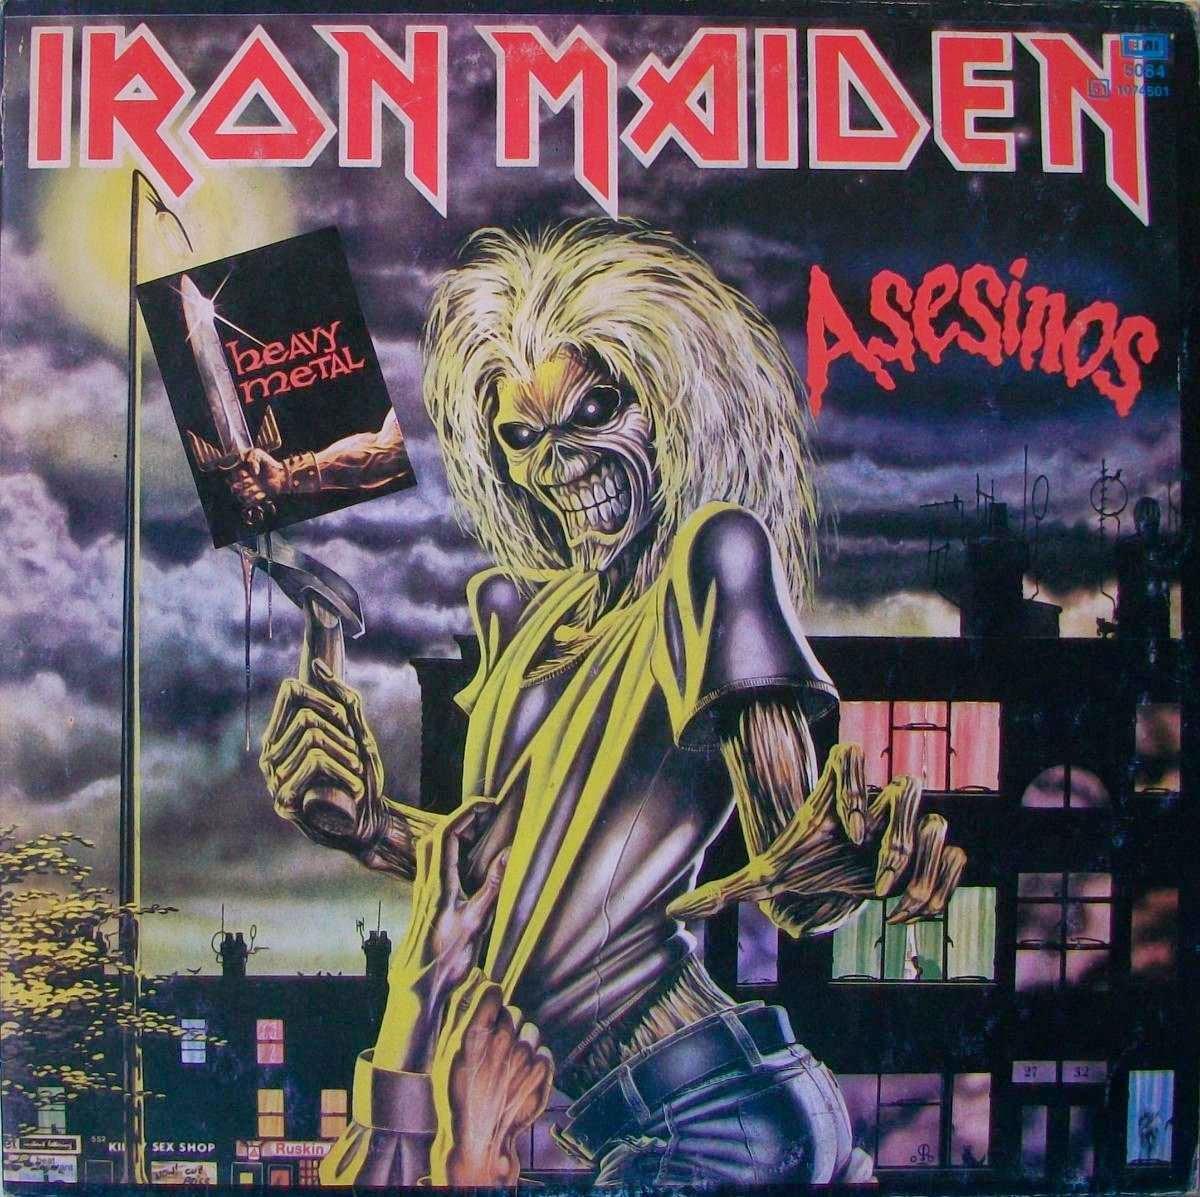 Metal Brutal Argentino Iron Maiden The Little Things She Needs Malmo Black White Tsn0001342c0256 Hitam 38 Asesinos 1981